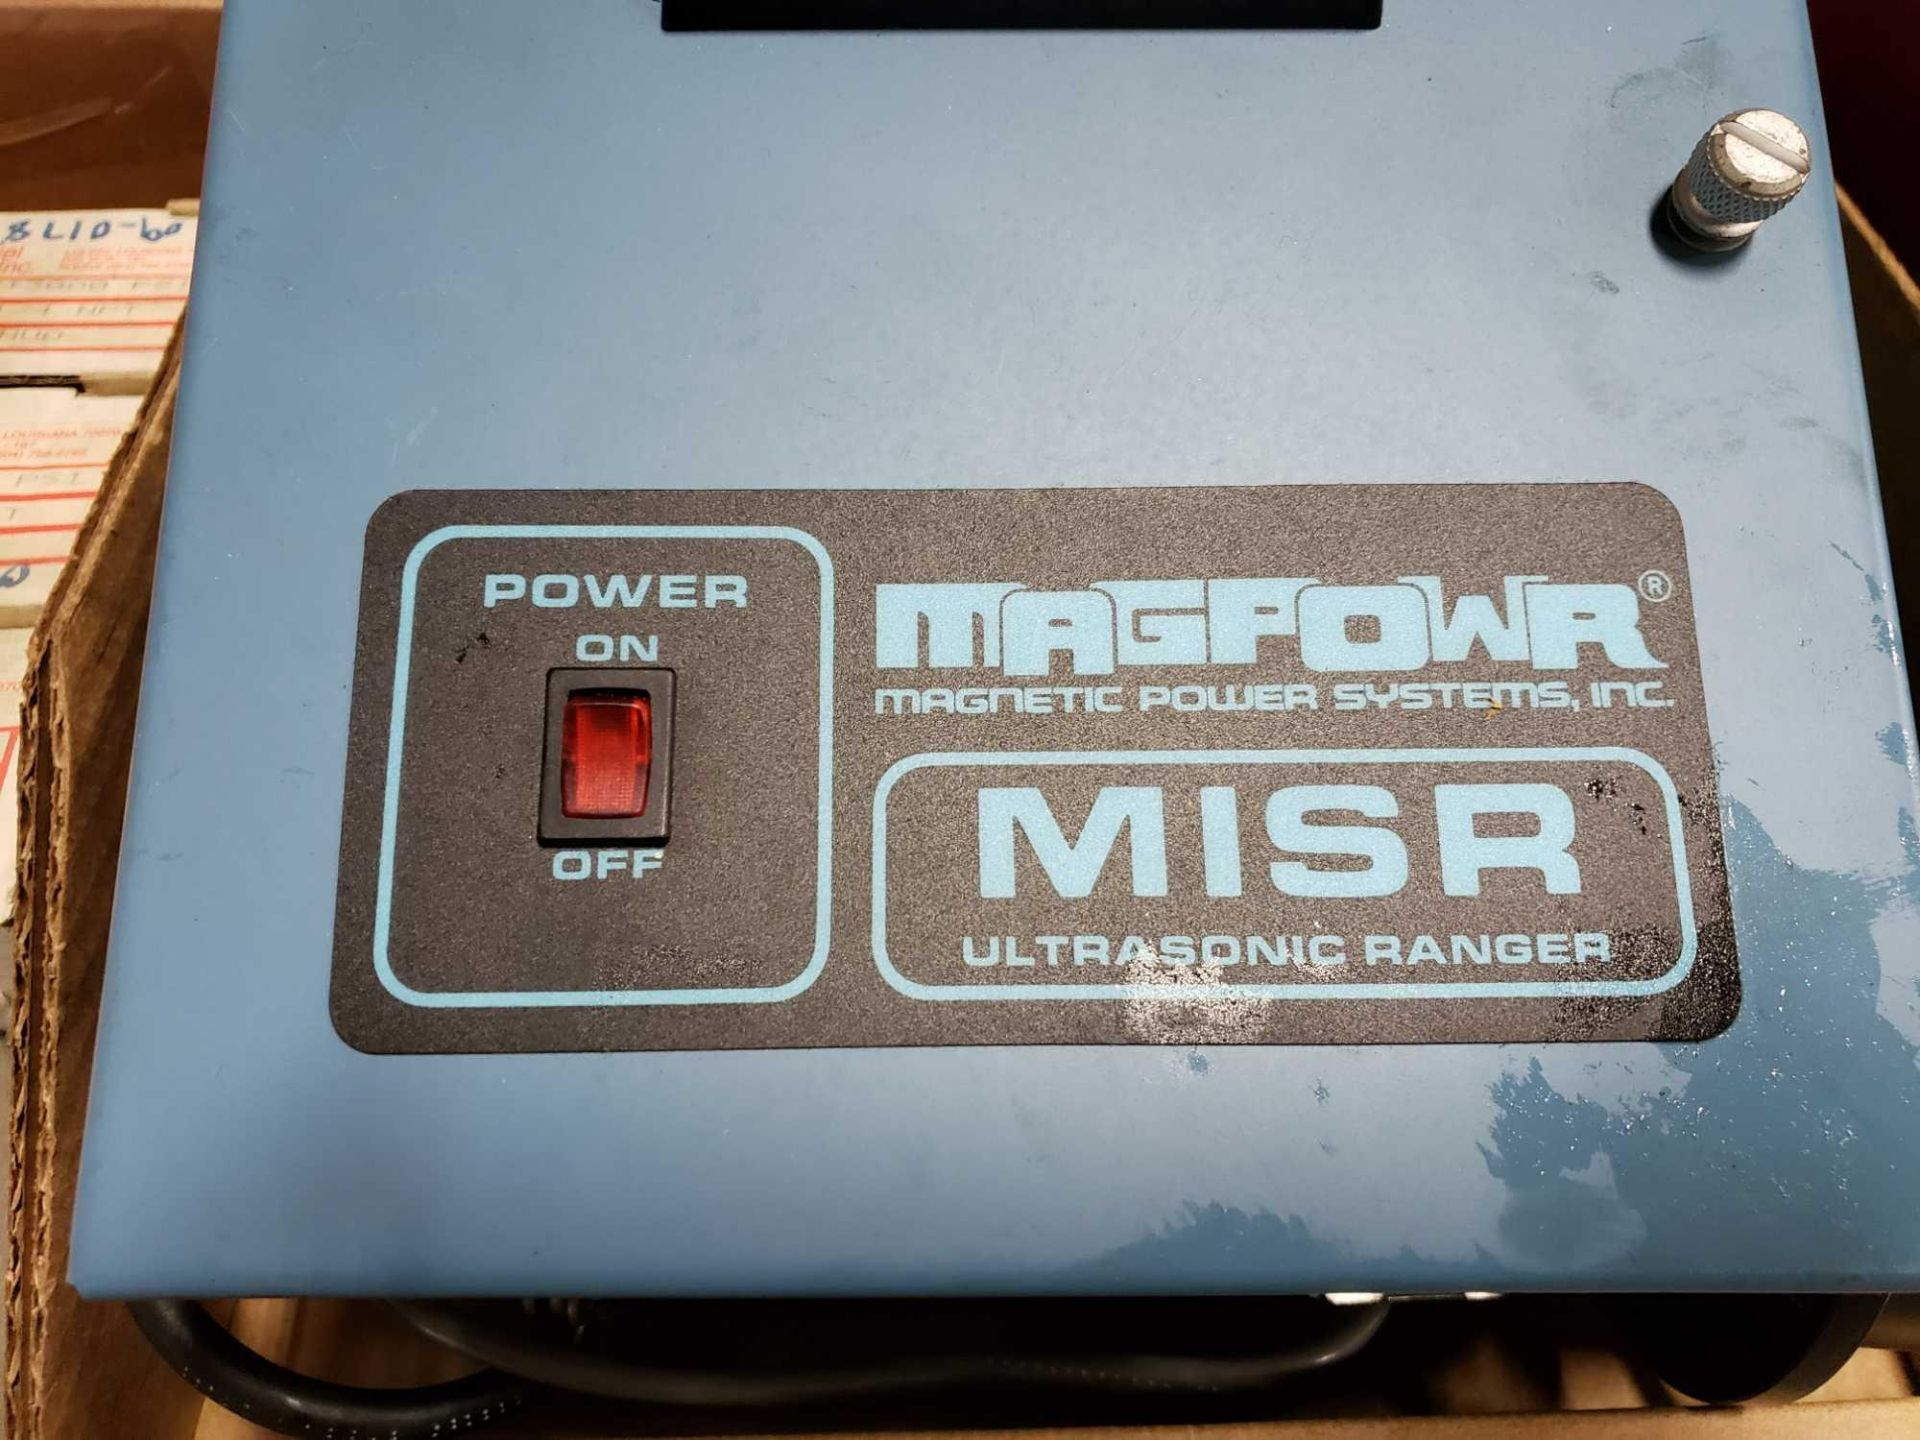 Lot 16 - MagPowr controller model MISR ultrasonic ranger.